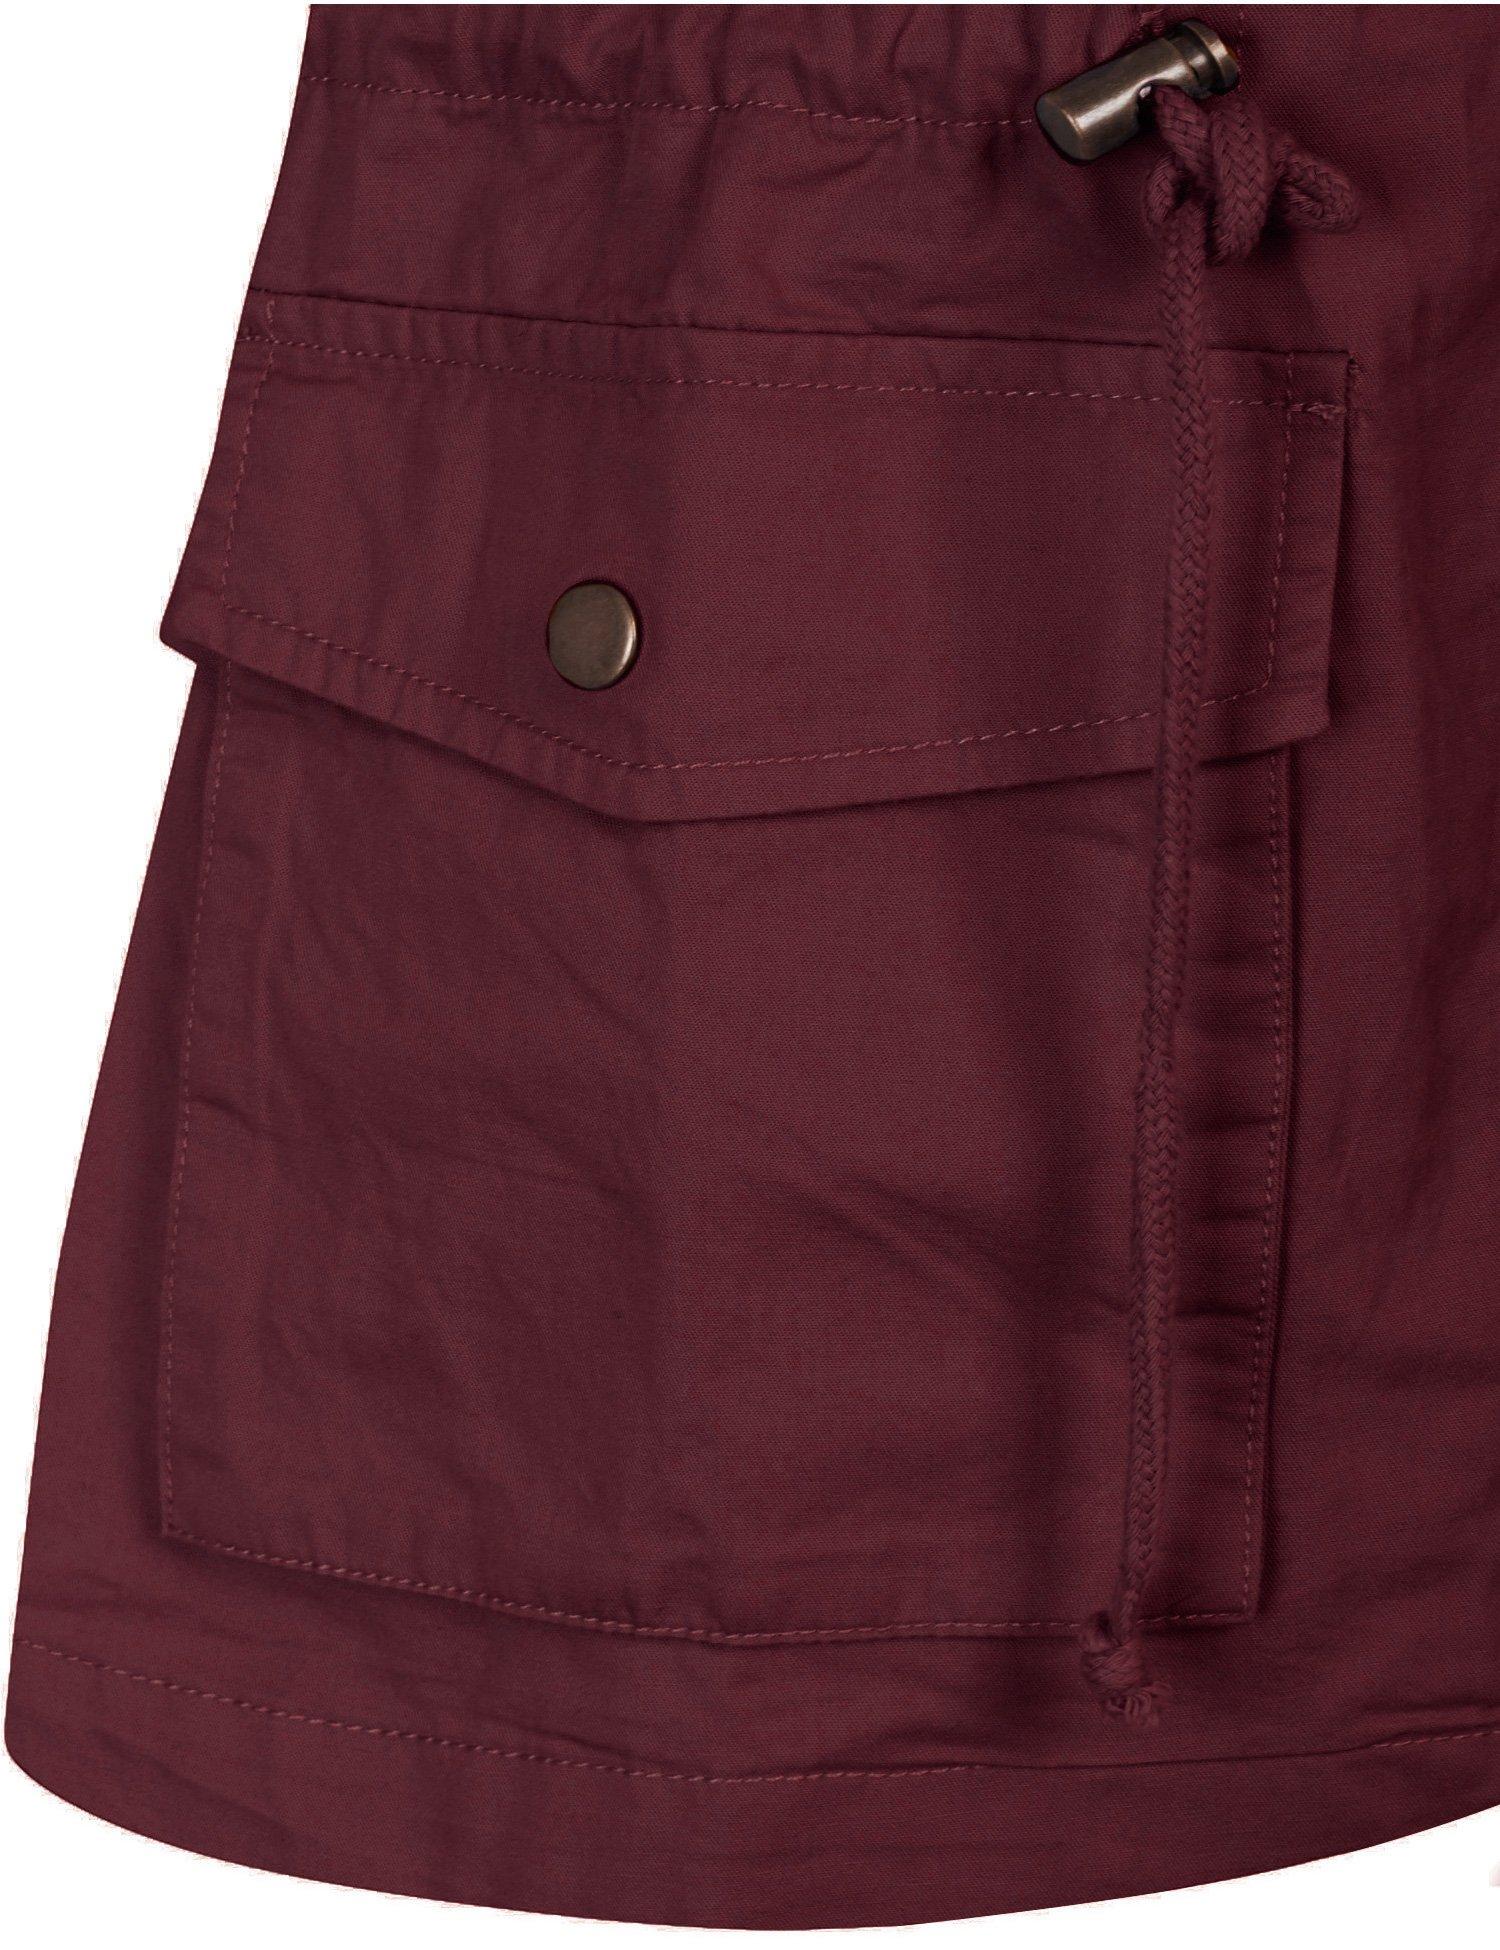 KOGMO Womens Military Anorak Safari Utility Vest with Hood-3X-WINE by KOGMO (Image #6)